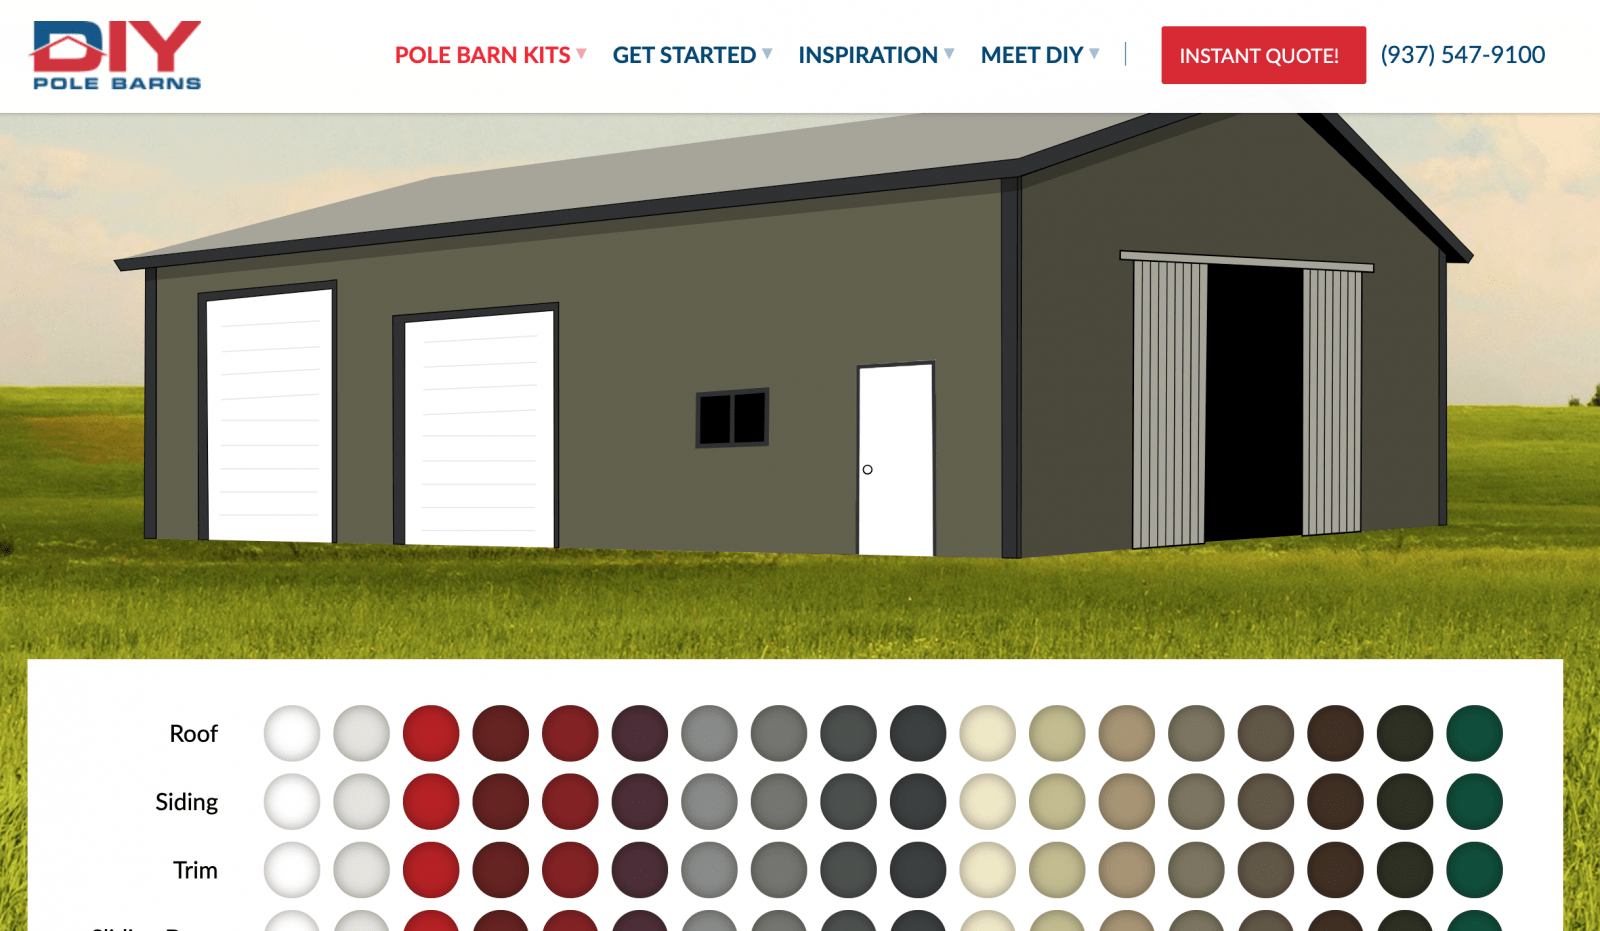 DIY Pole Barns color visualizer